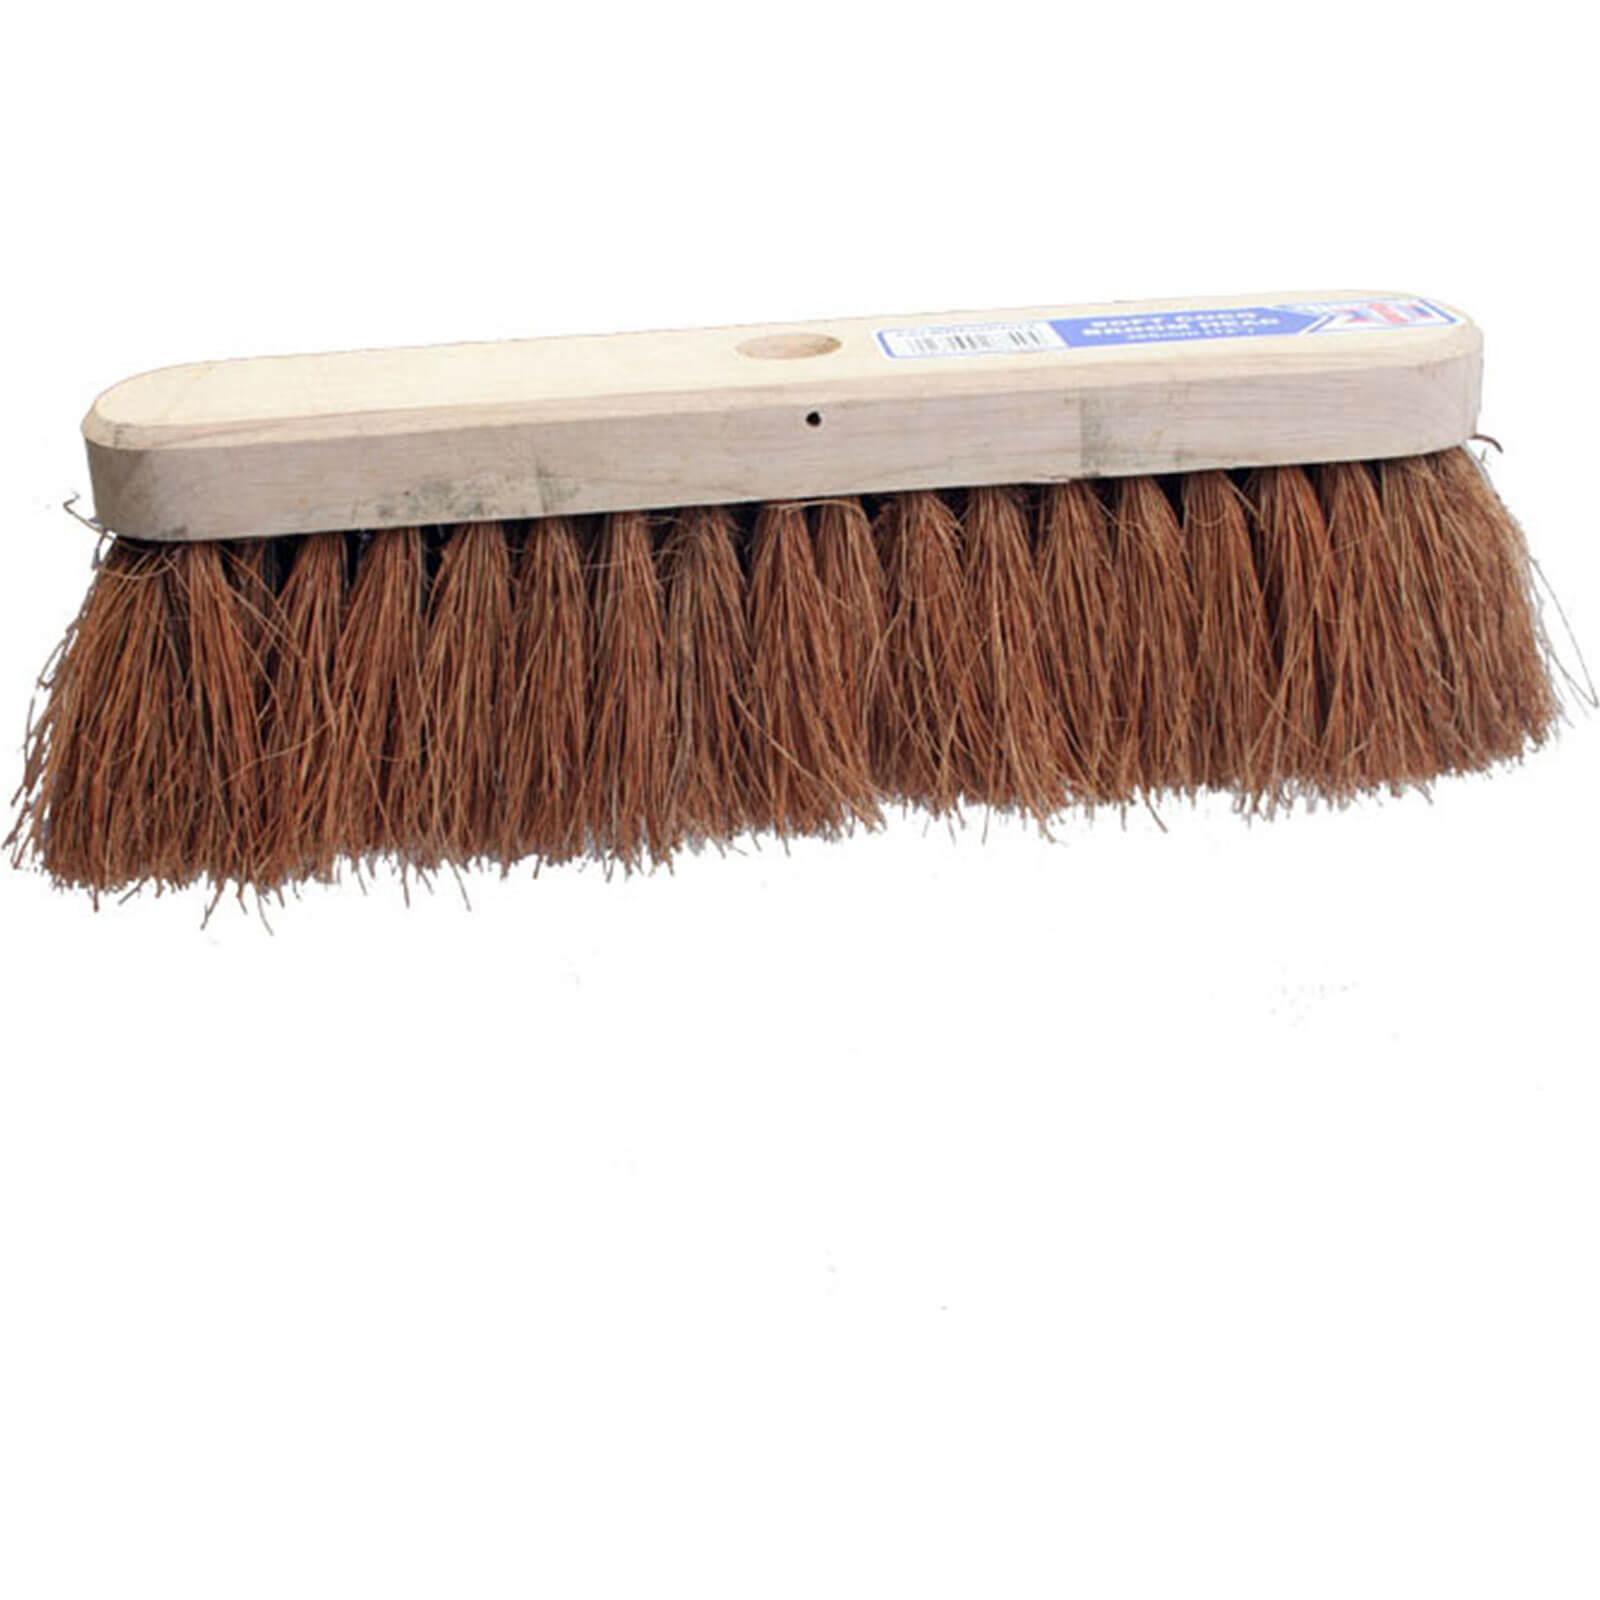 "Tooled Up/Tools/Shovels, brushes & wheelbarrows/Faithfull Soft Coco Broom Head 12"""